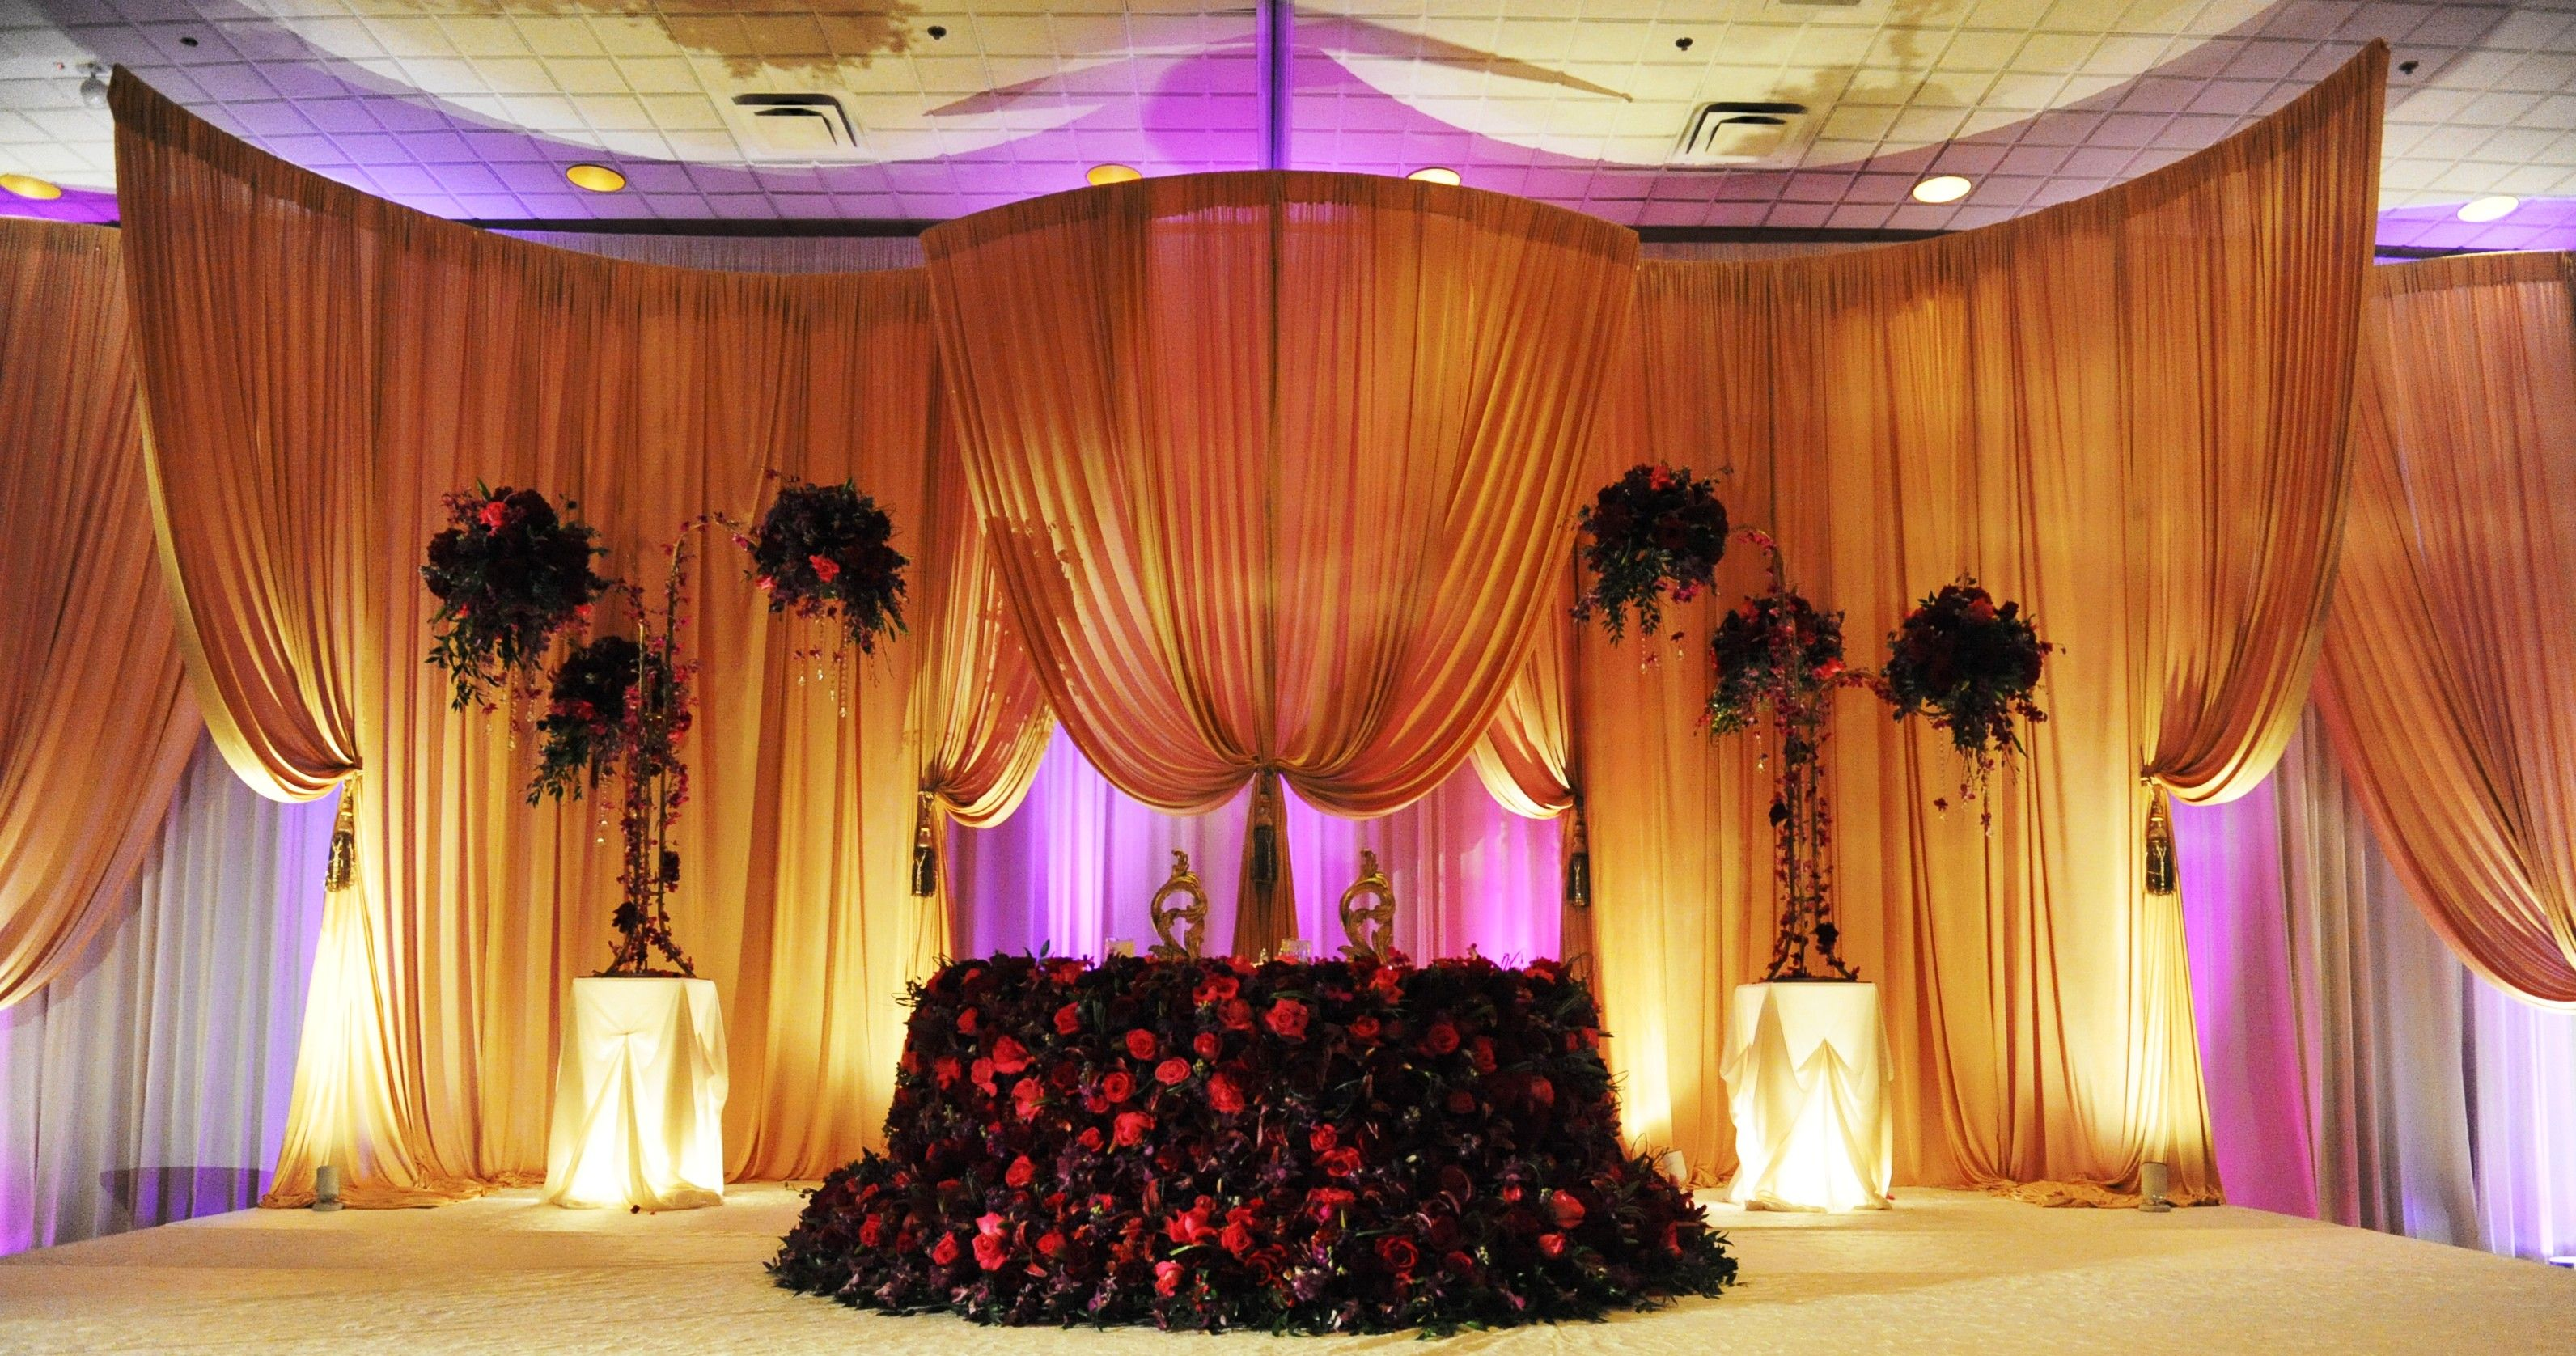 Luxury Wedding Decorations Floral Chicago Yanni Design Studio Luxury Wedding Decor Decor Wedding Backdrop Rentals